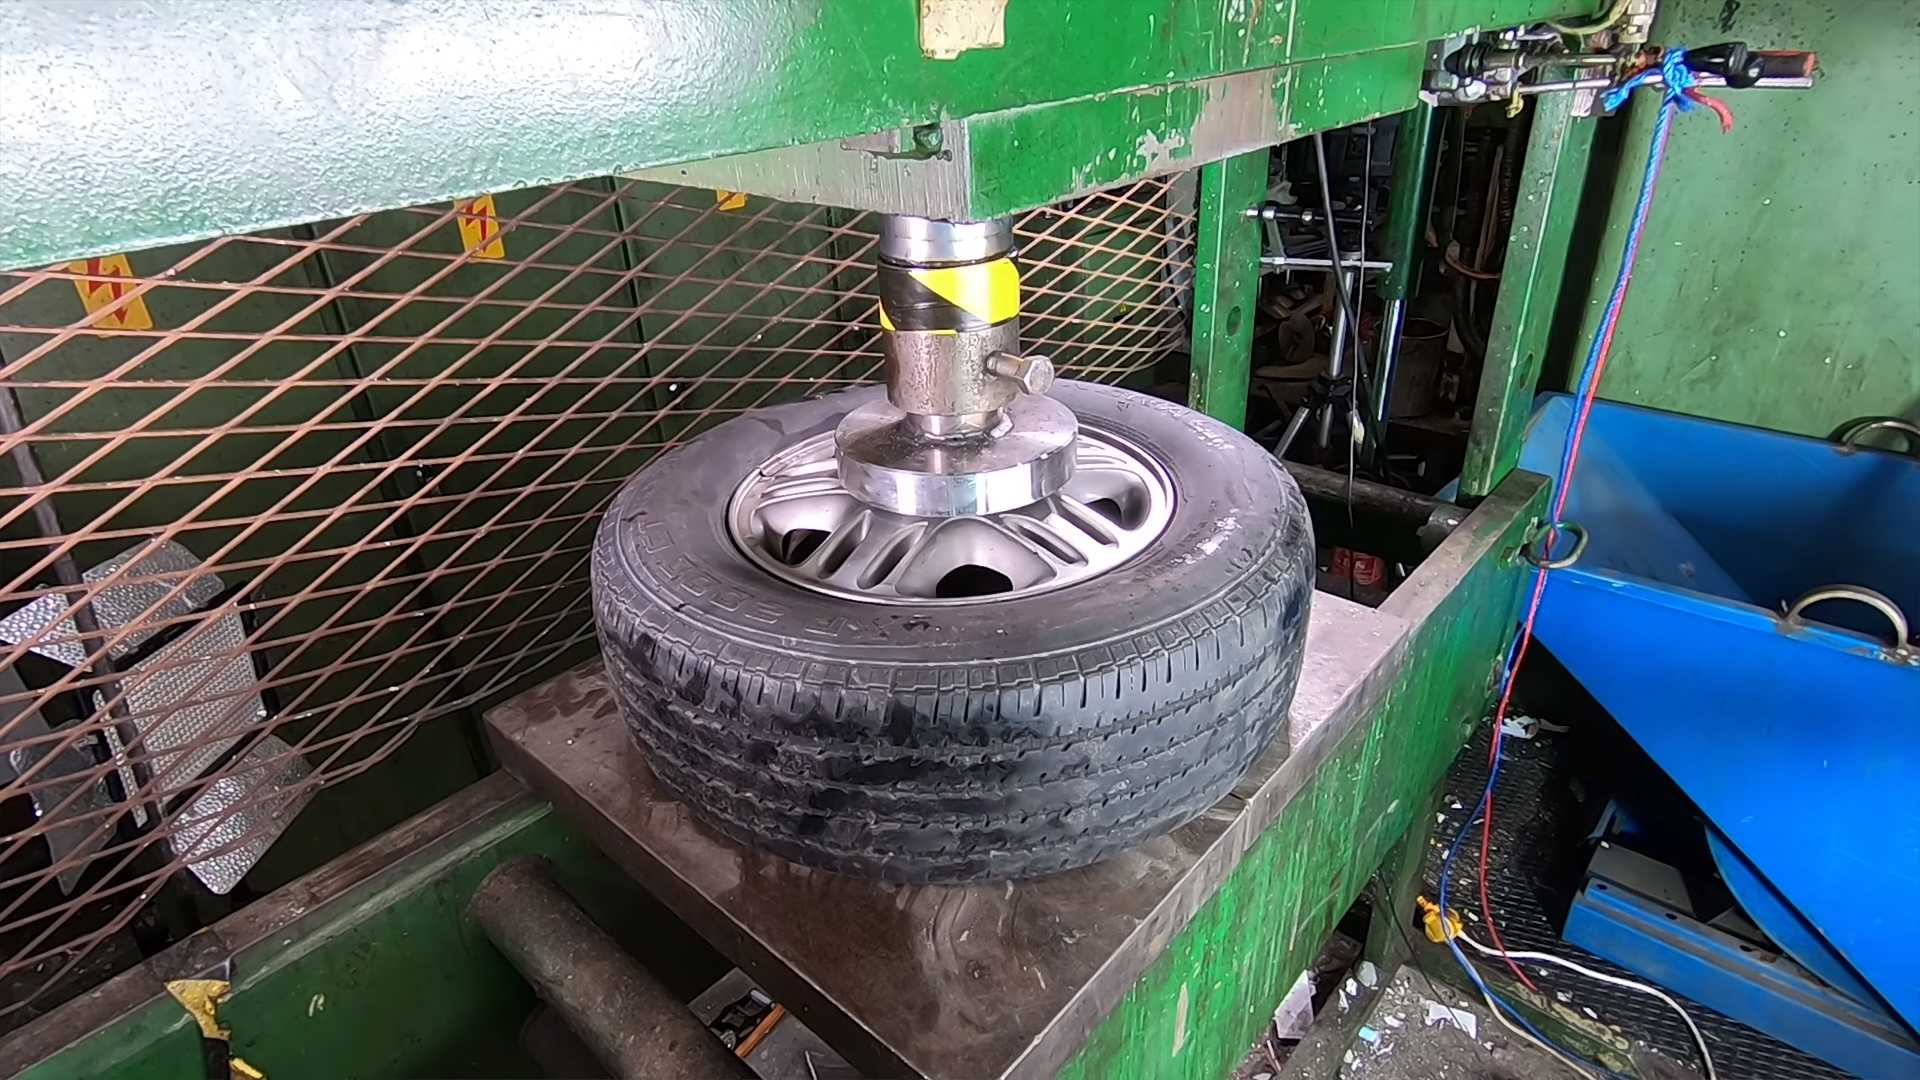 wheel-crushed-in-hydraulic-press-2 Ce fel de roata este mai rezistenta? Janta de otel vs janta de aliaj